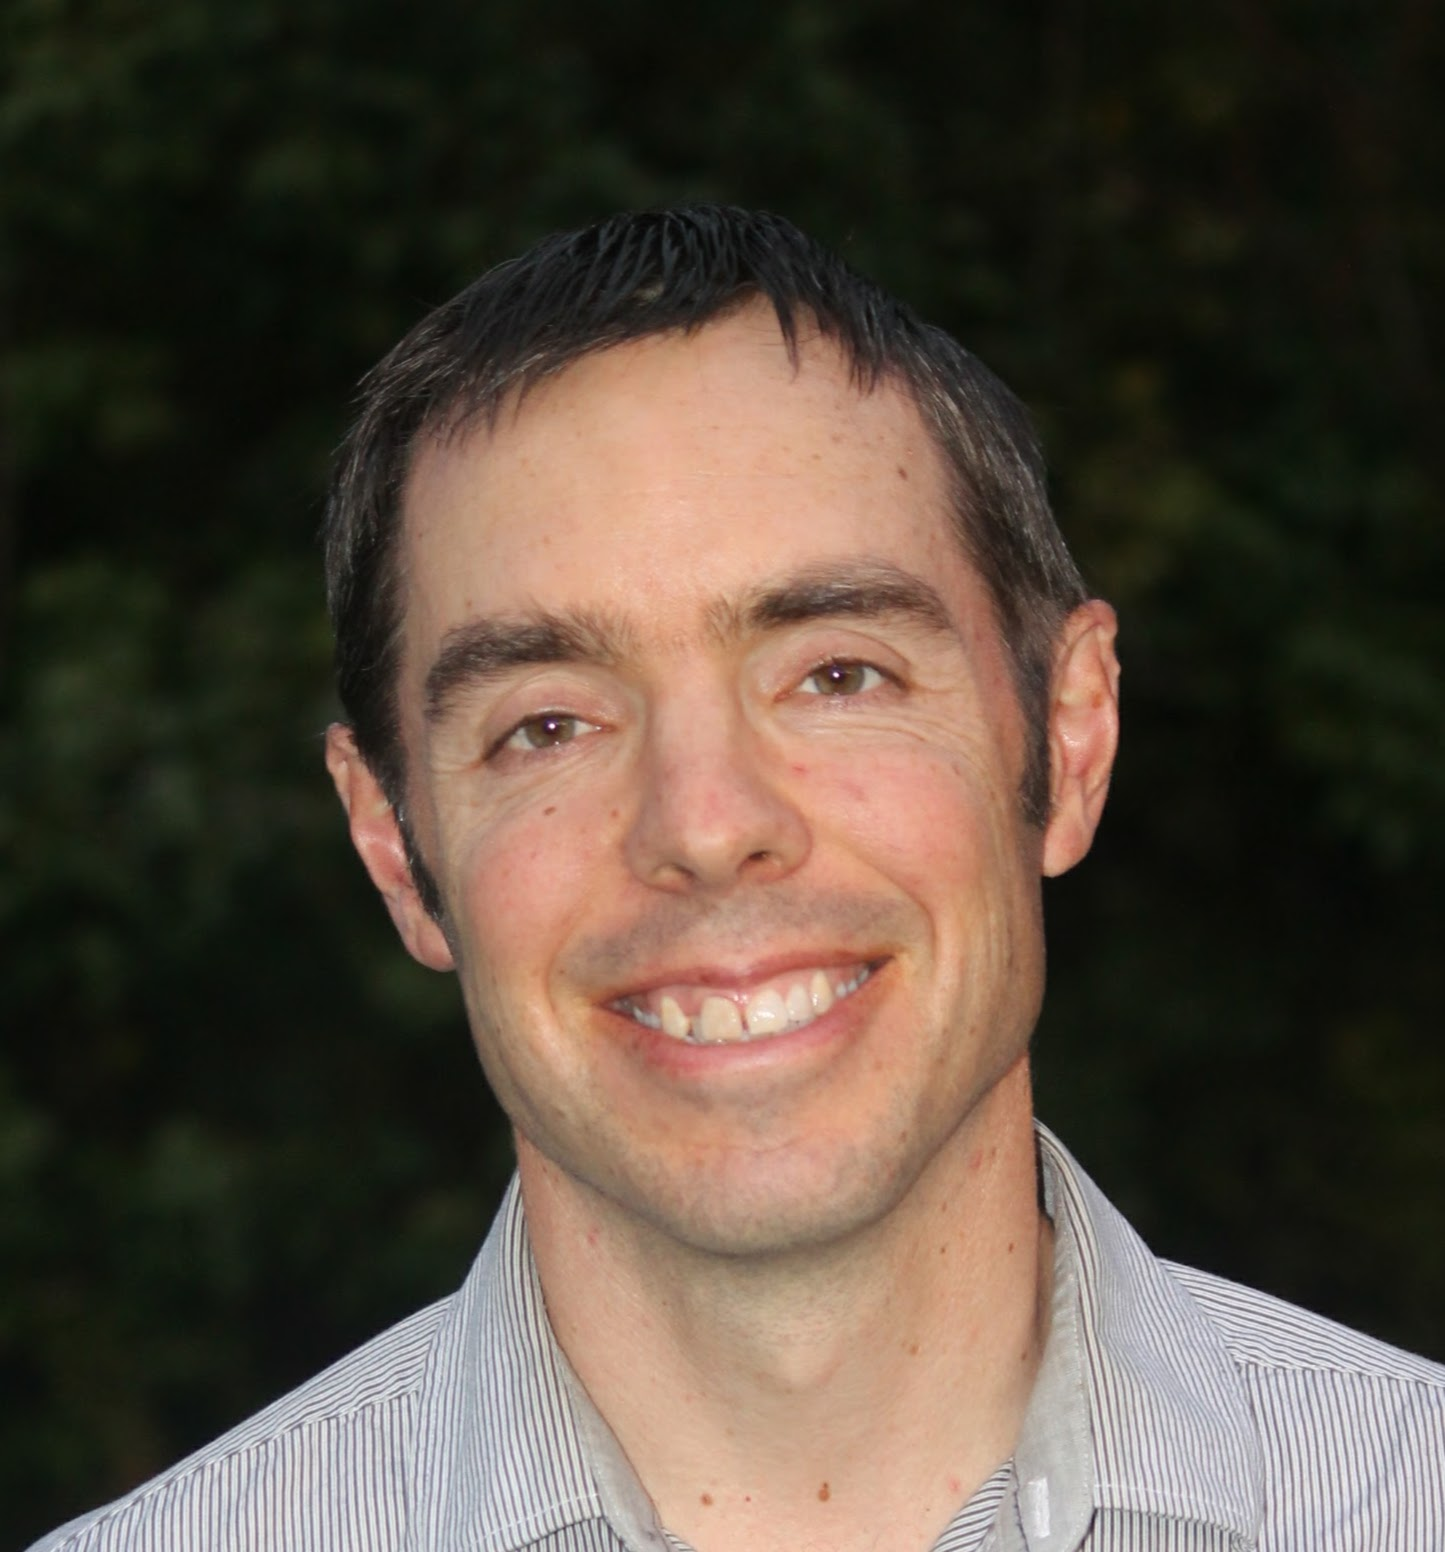 Dustin Moody